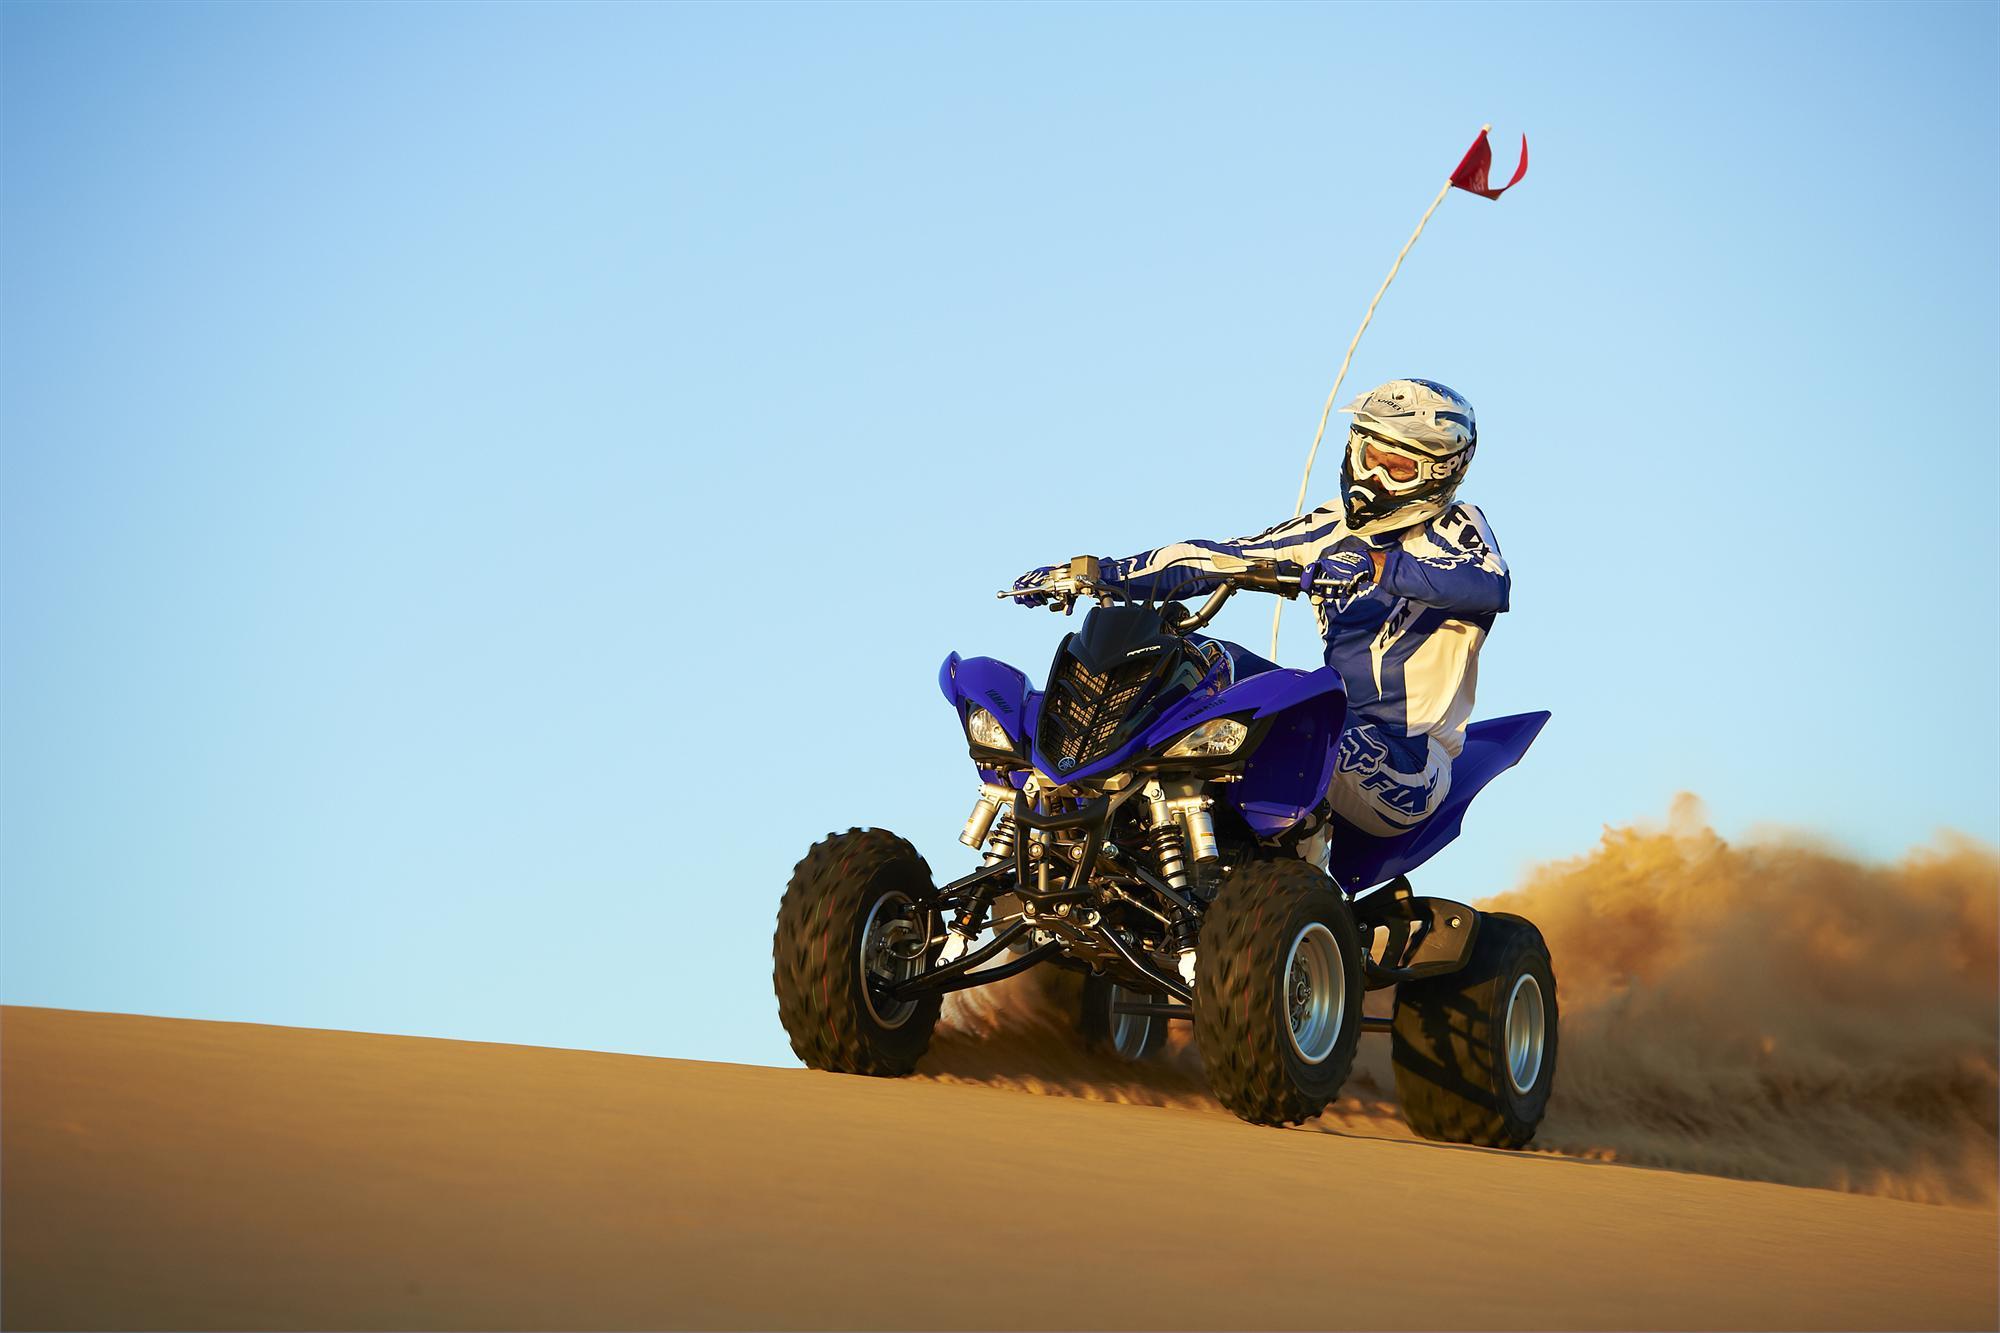 Спортивный квадроцикл Yamaha Raptor (Ямаха Раптор) YFM 250 R — обзор и характеристики модели